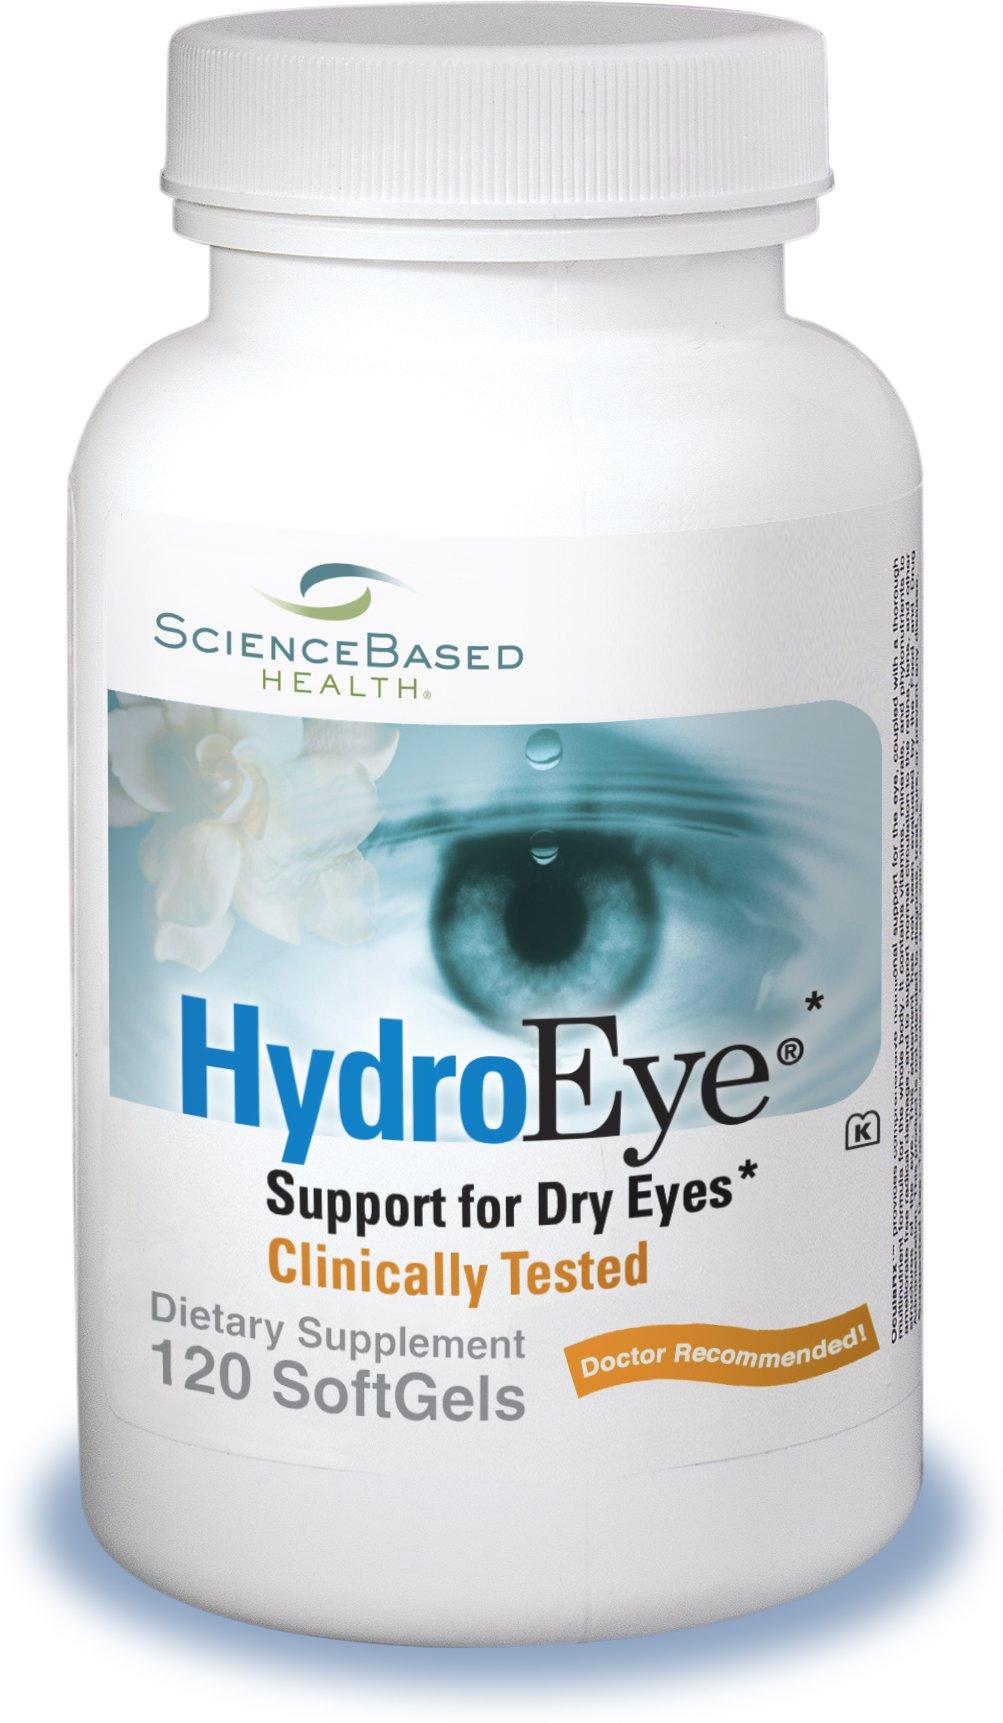 HydroEye Softgels - Dry Eye Relief - 120 Count